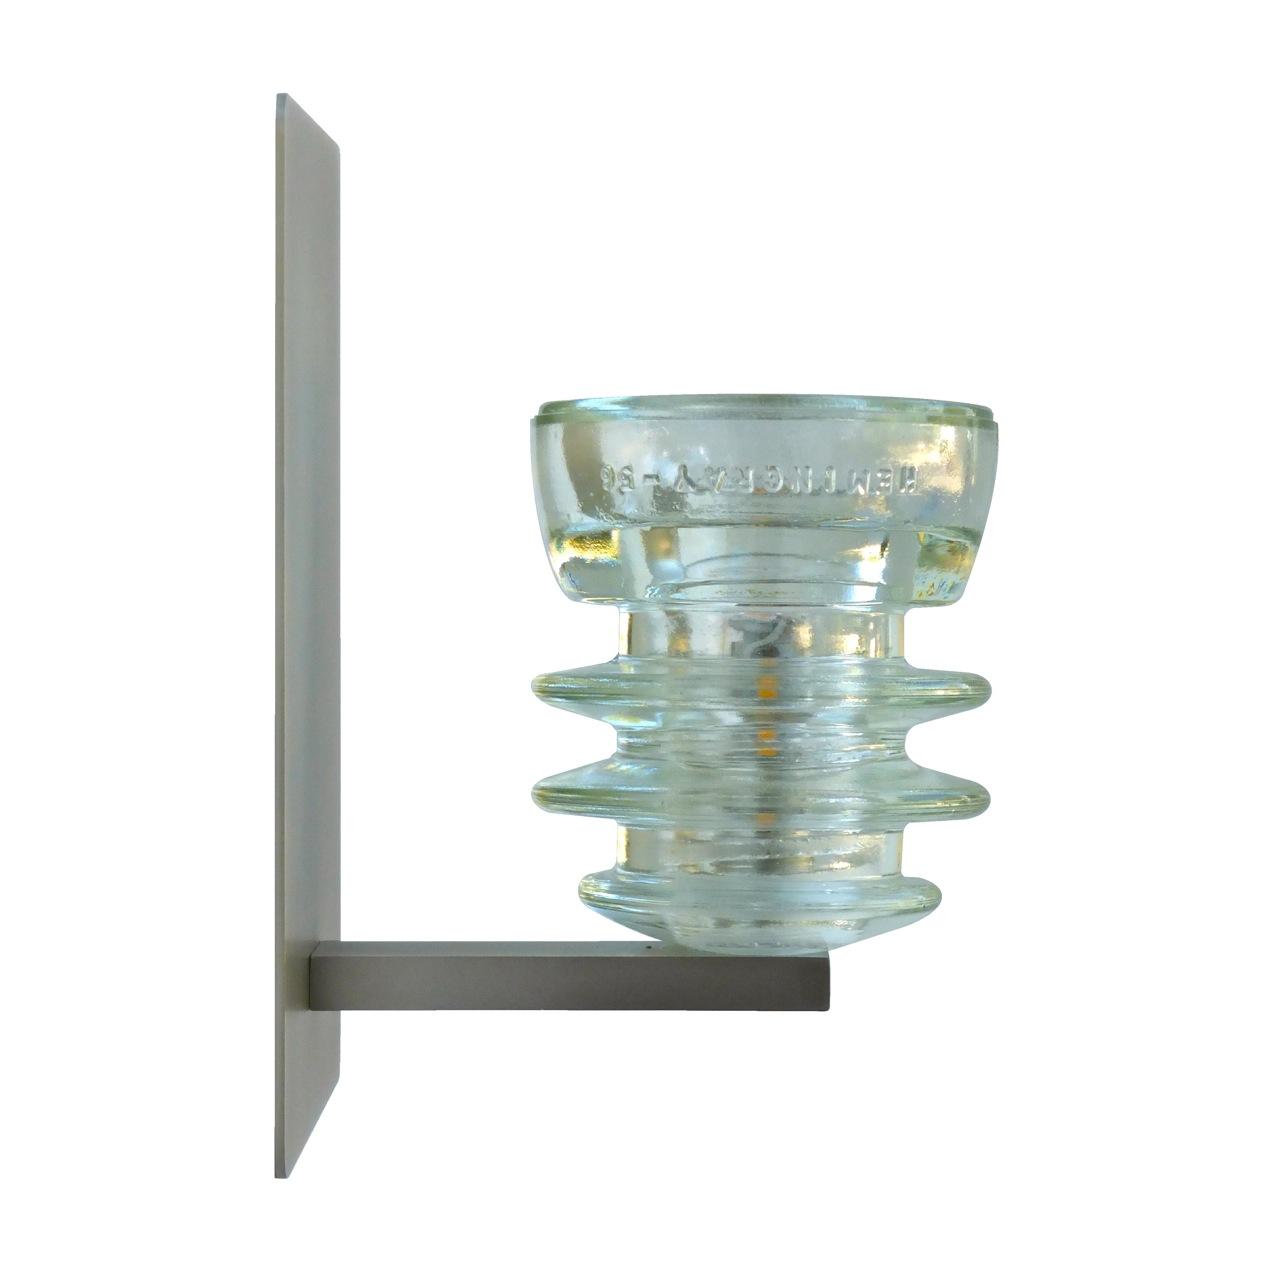 lis wall candlestick set design home candle de portfolio sconce holder cayton from fleur